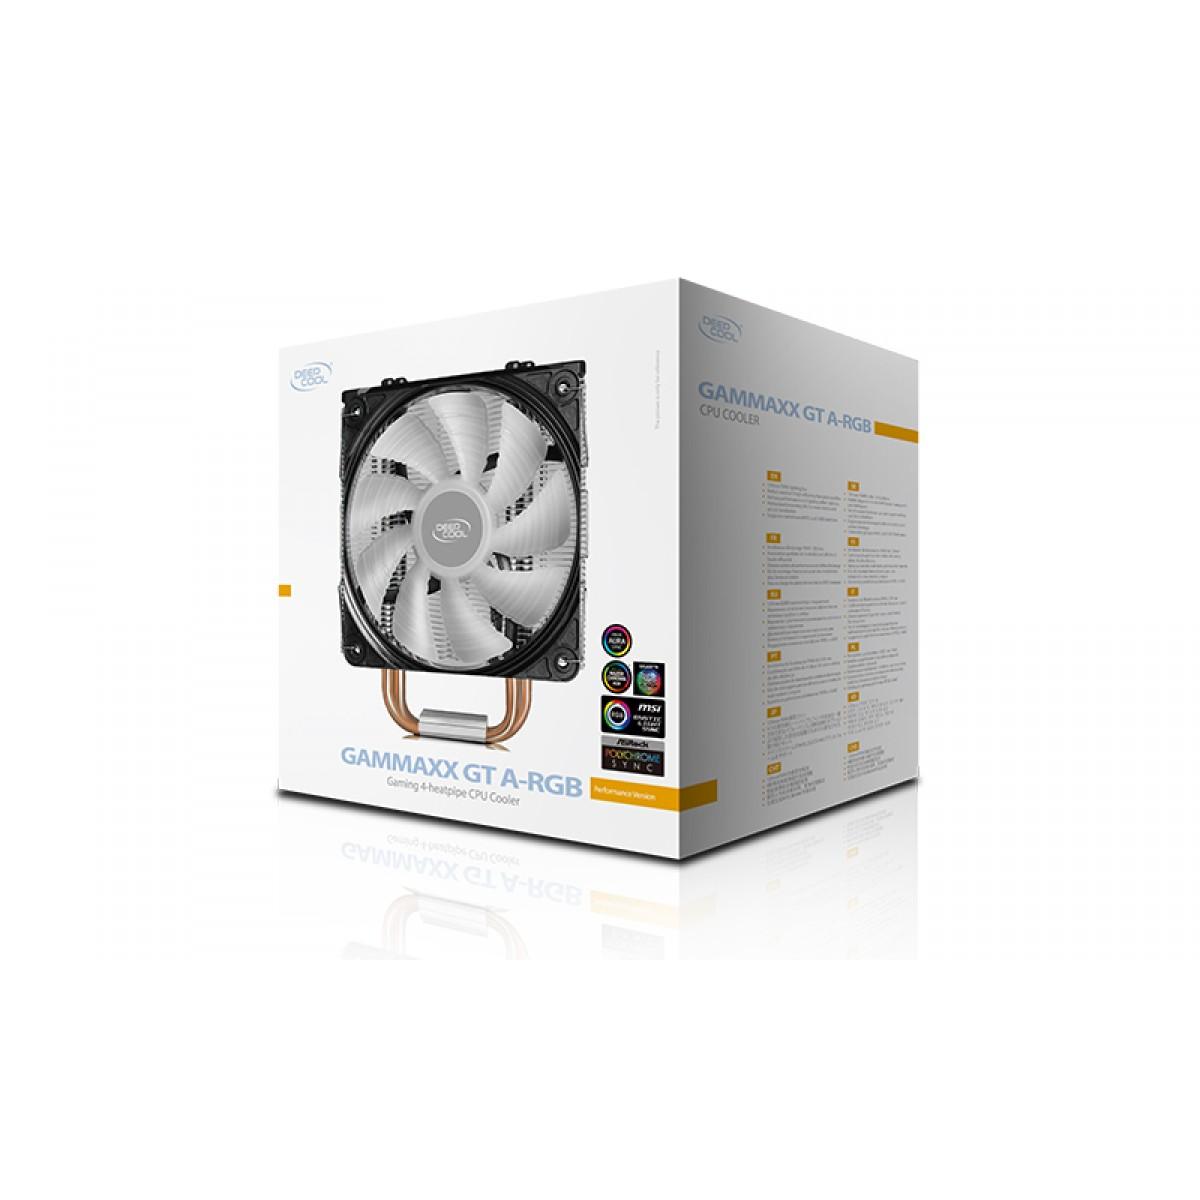 Cooler para Processador DeepCool Gammaxx GT A-RGB, 120mm, Intel- AMD, DP-MCH4-GMX-GT-ARGB